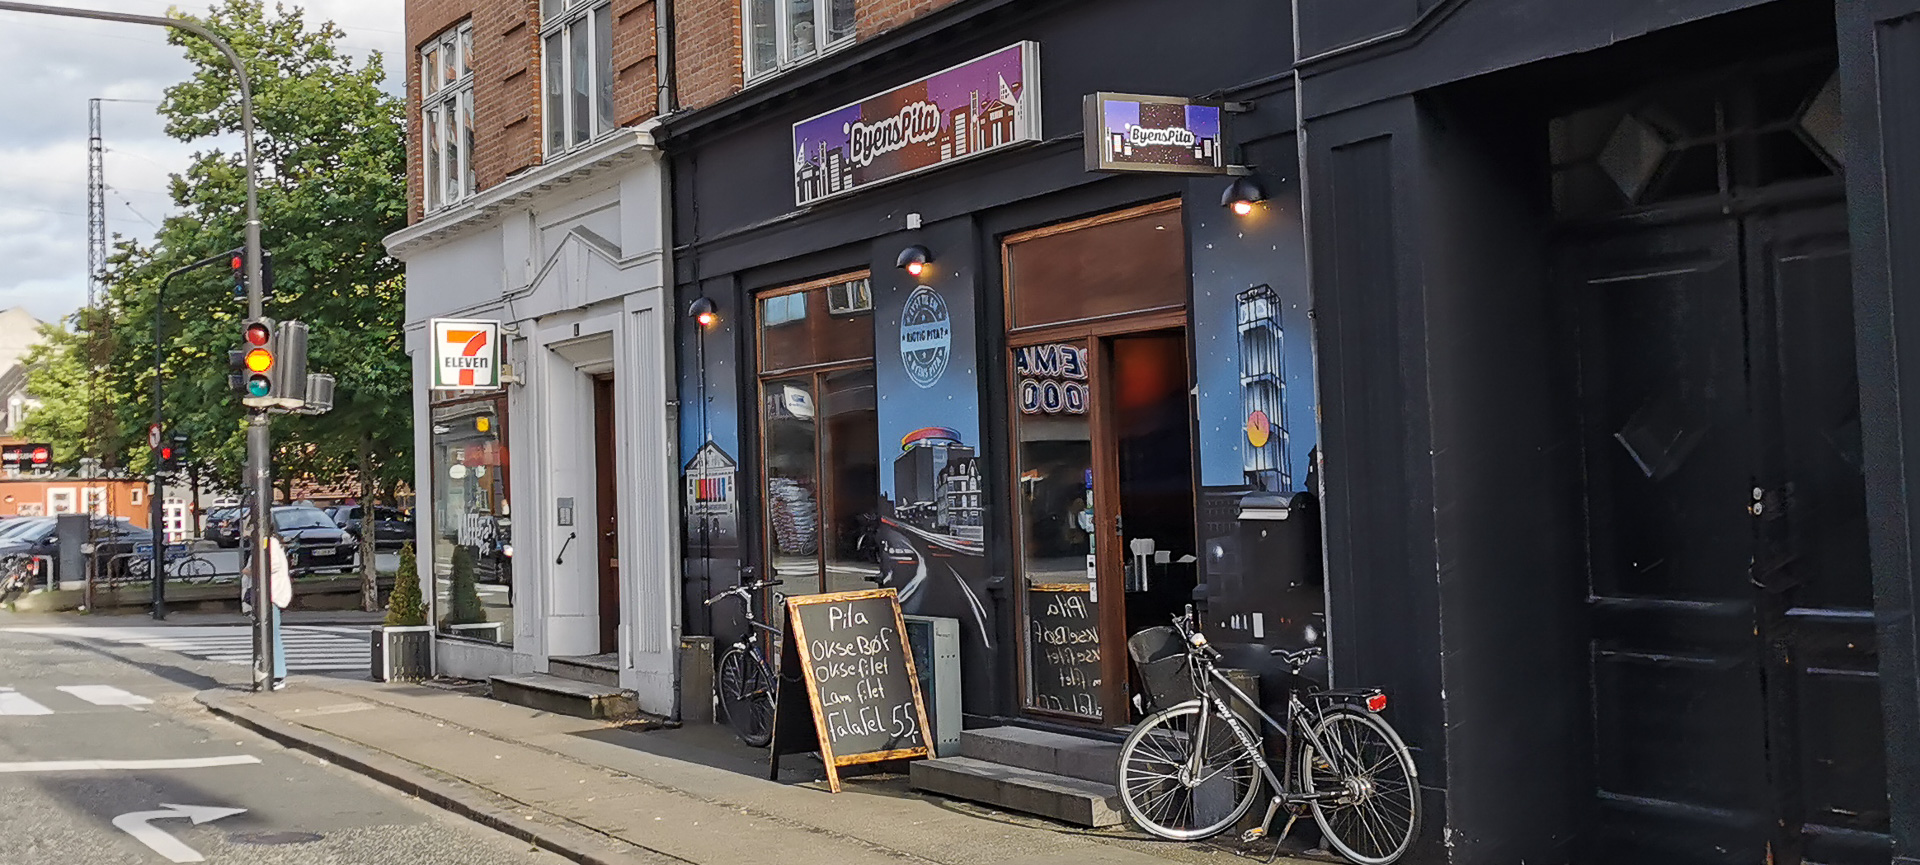 Nyt på Vesterbro i Aarhus: Asiatisk restaurant lukker - ny pita-restaurant udvider med nr. 2